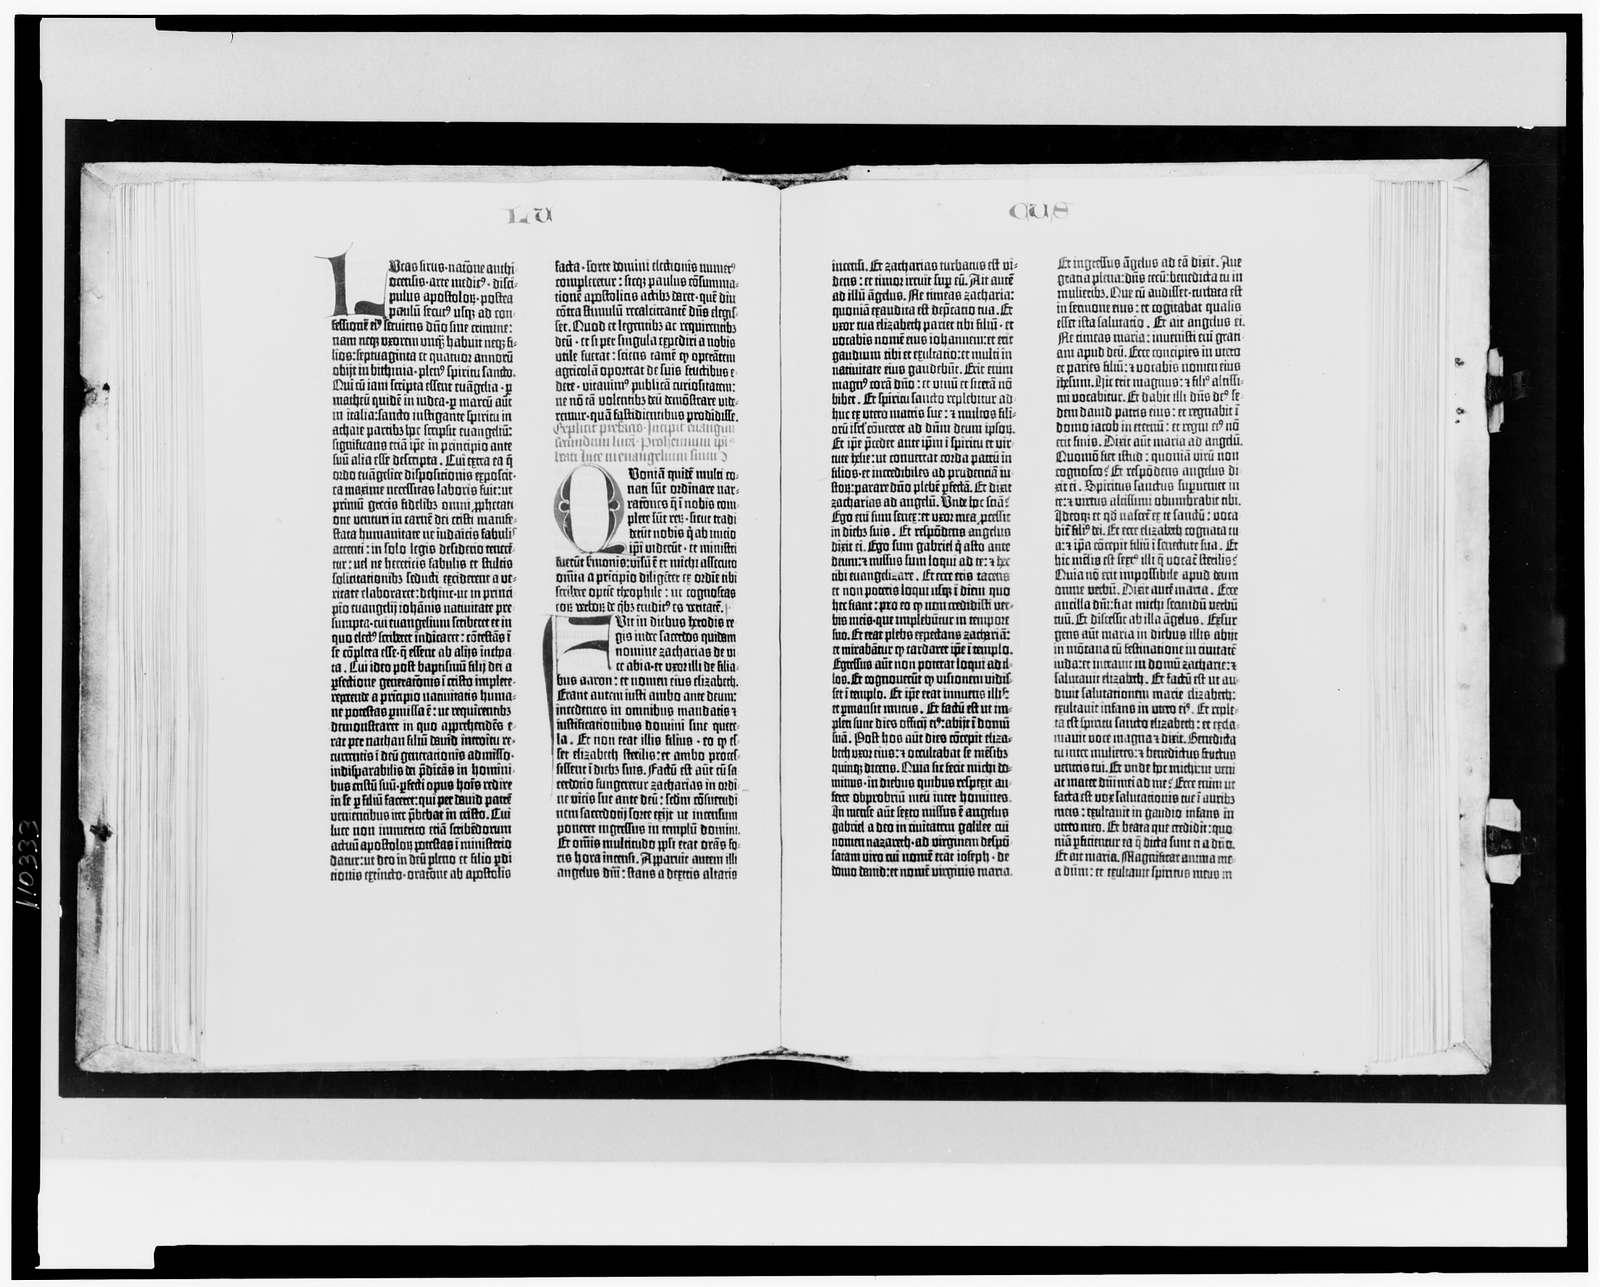 [Gutenberg Bible opened to the beginning of the Gospel of Luke]